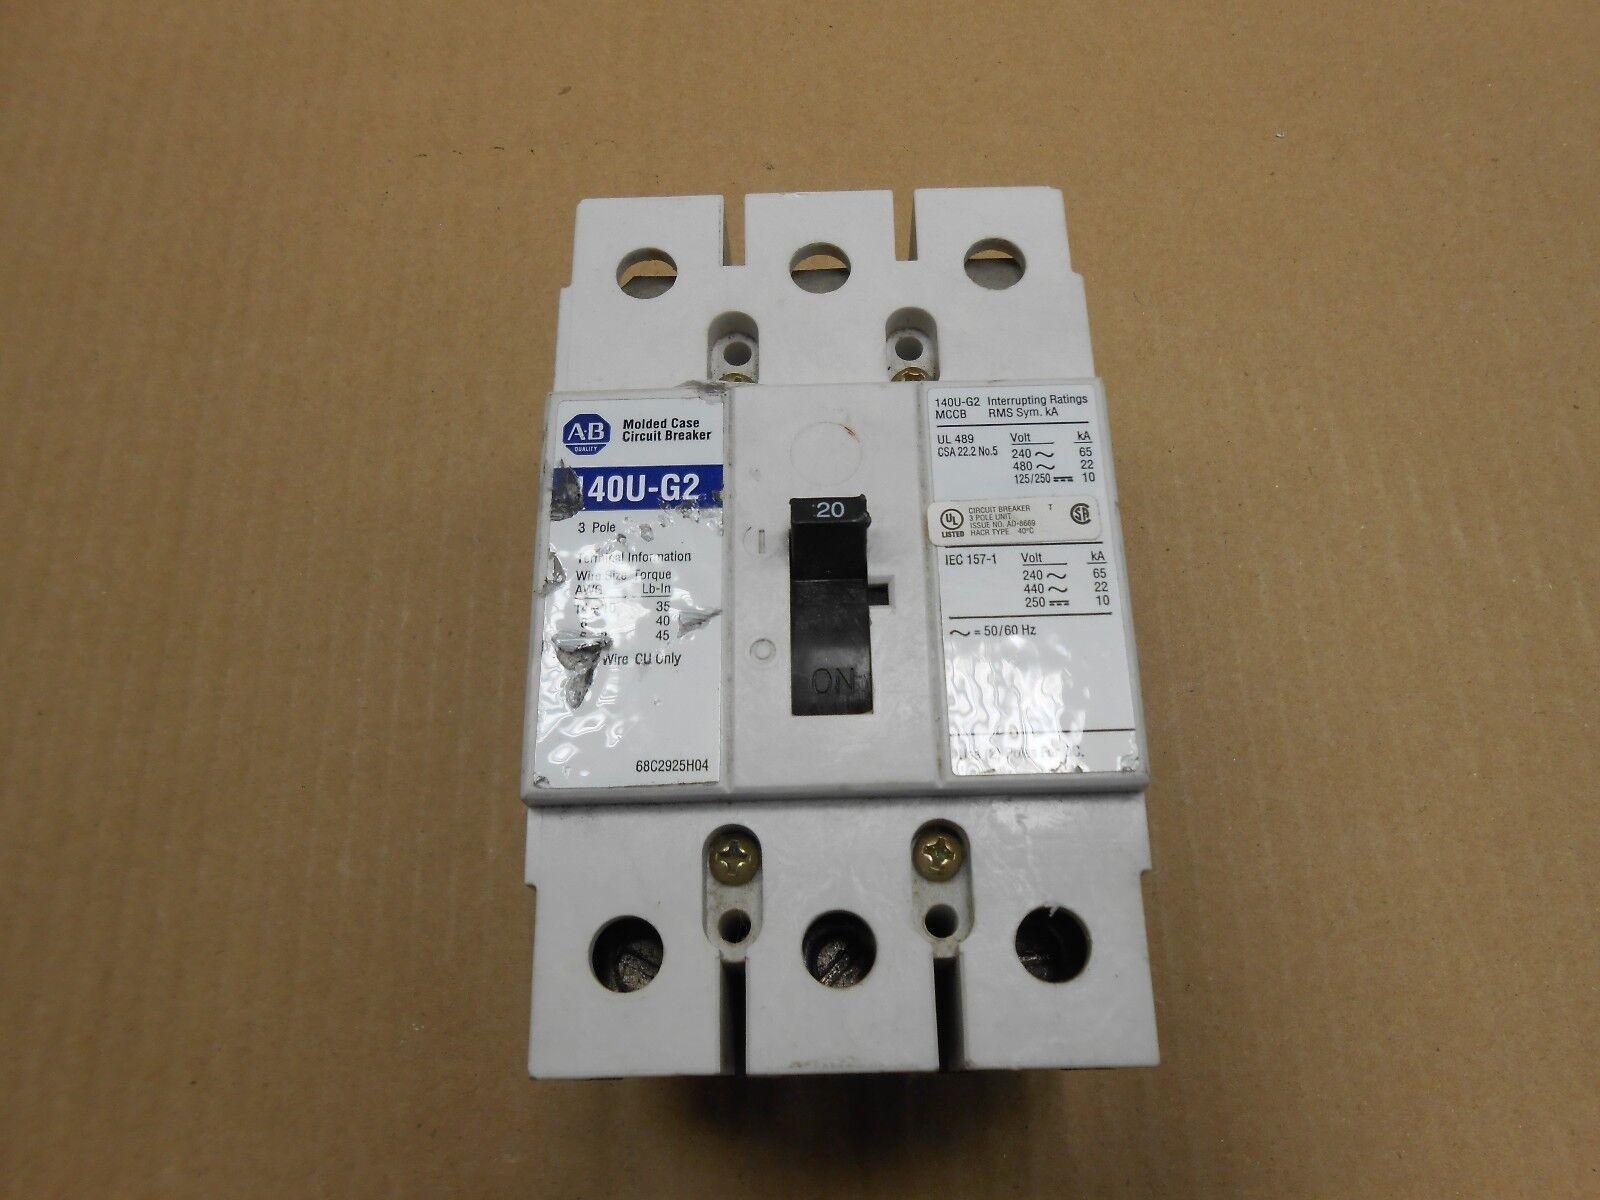 Allen Bradley 140u-g2c3-c20 3 Pole 20 Amp Circuit Breaker | eBay